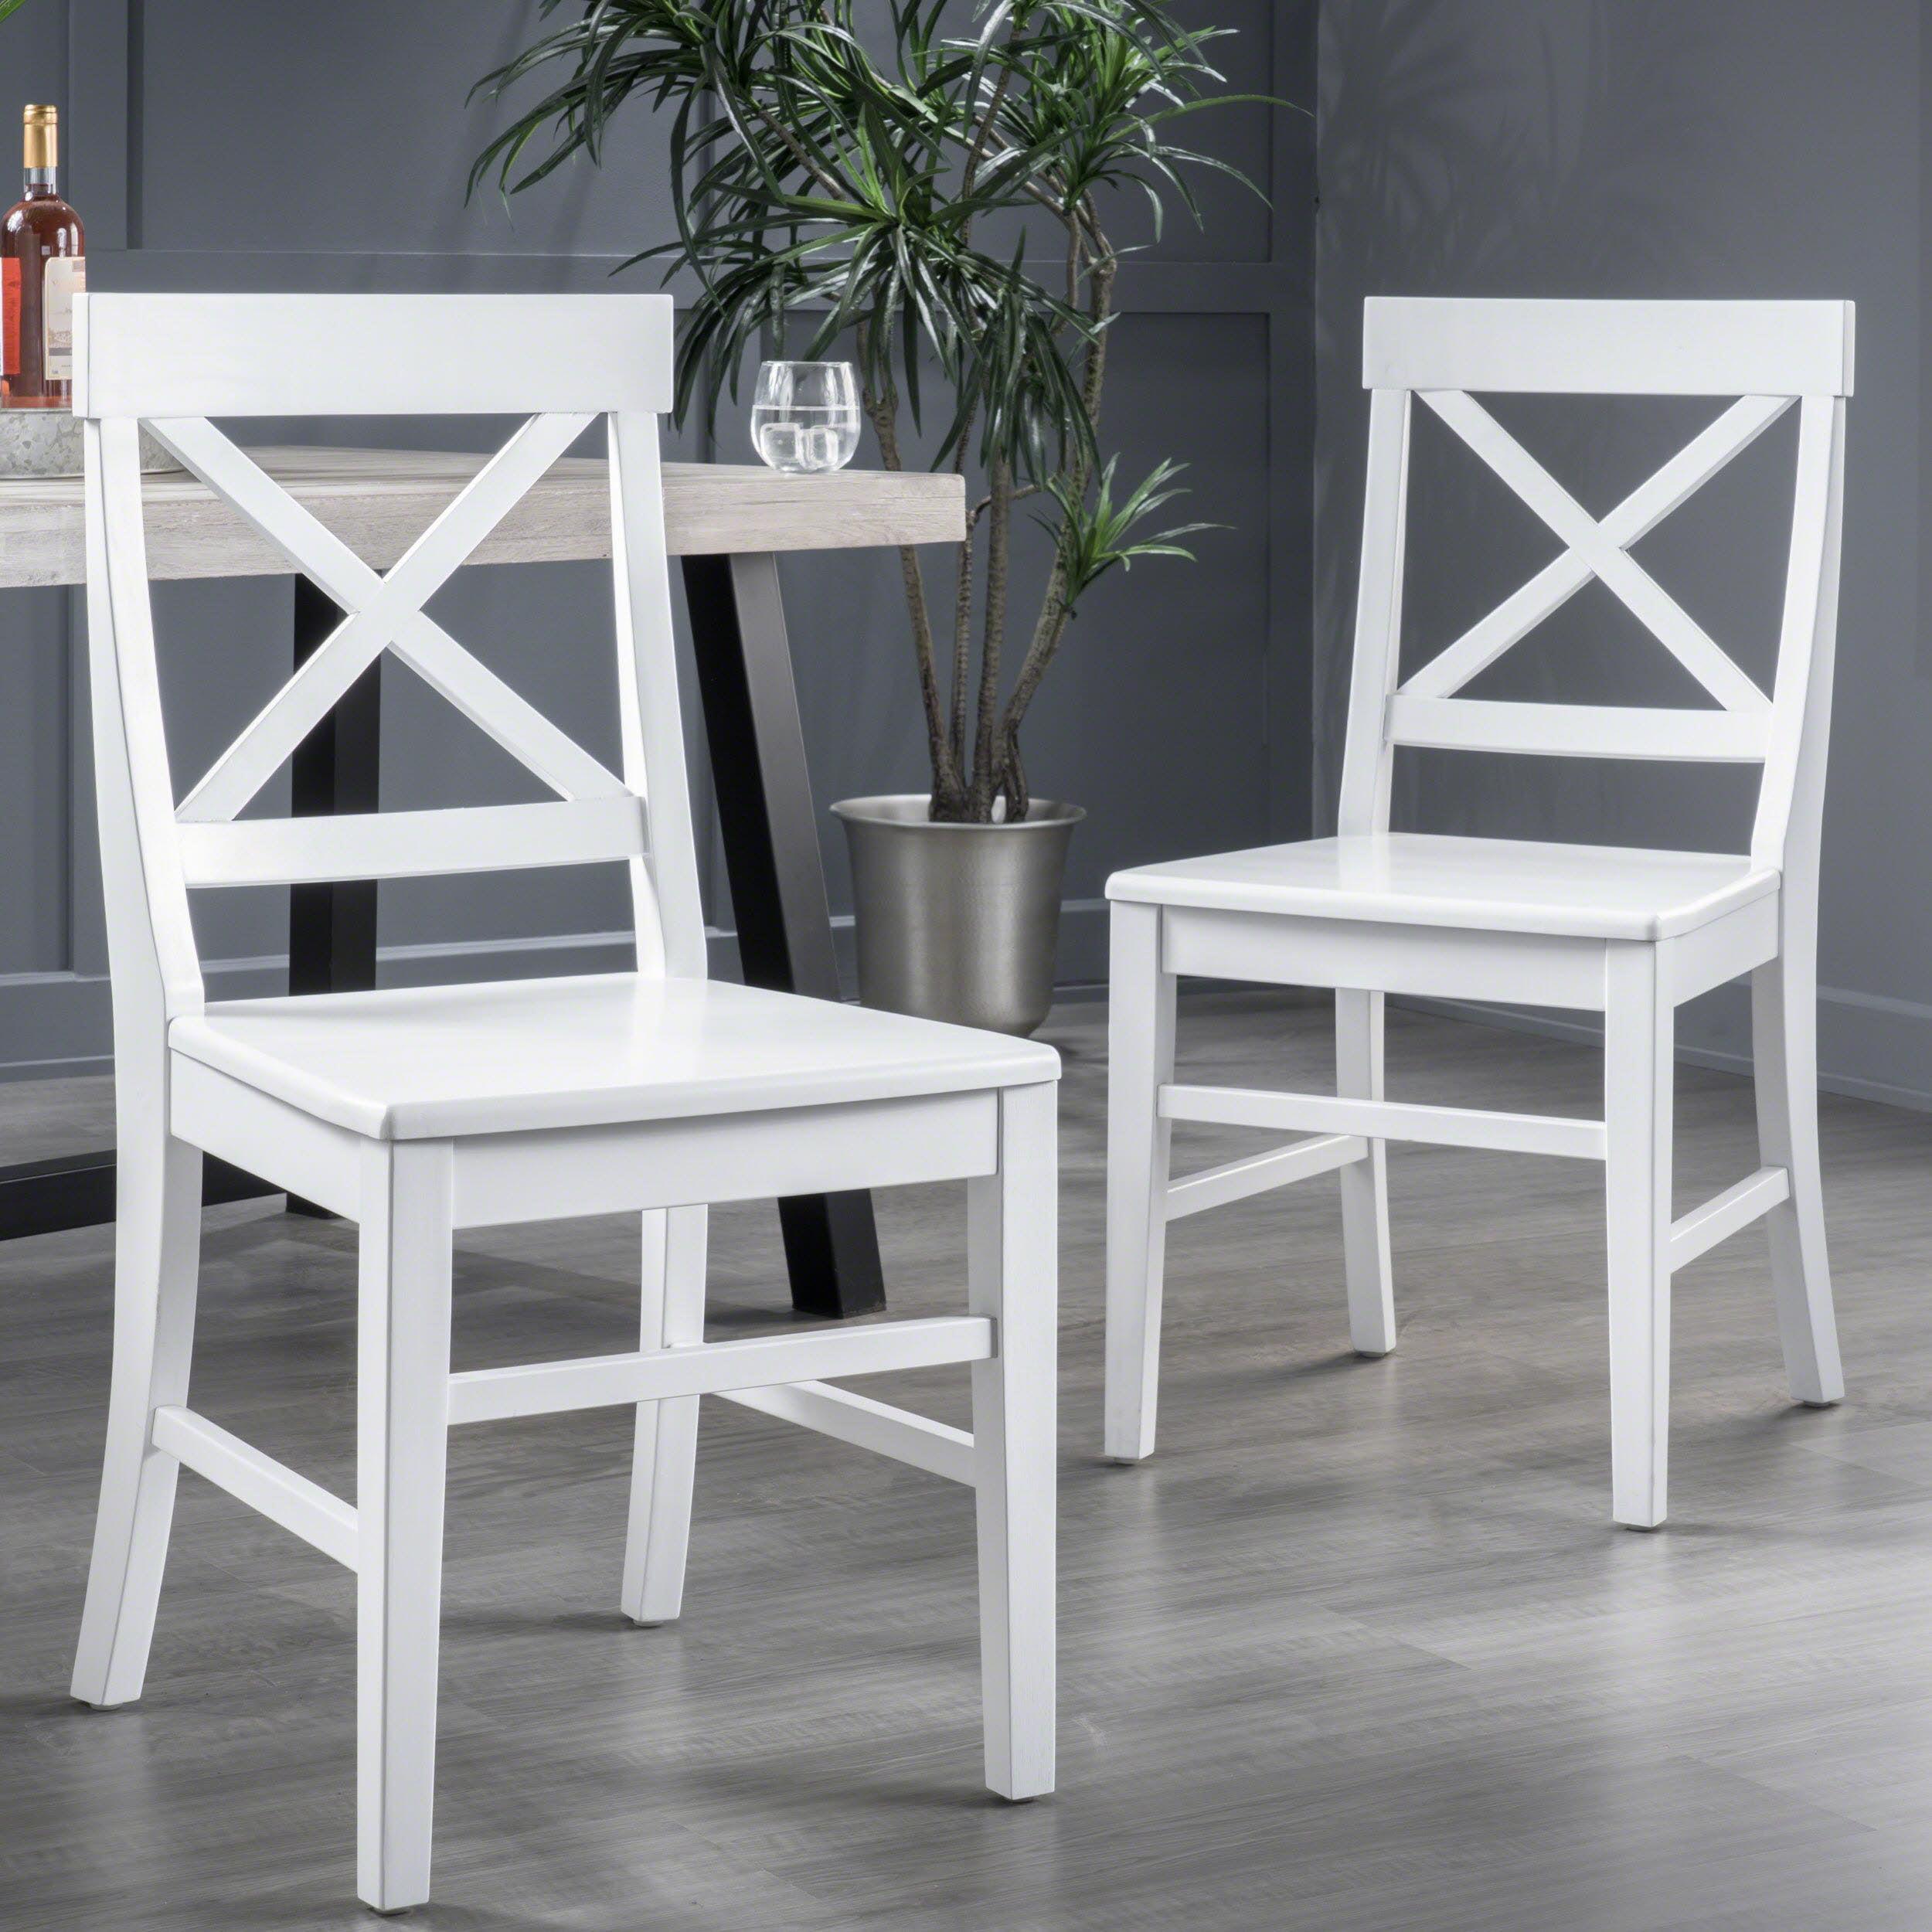 Noble House Roseann Farmhouse Finish Acacia Wood Dining Chairs White Walmart Com Walmart Com